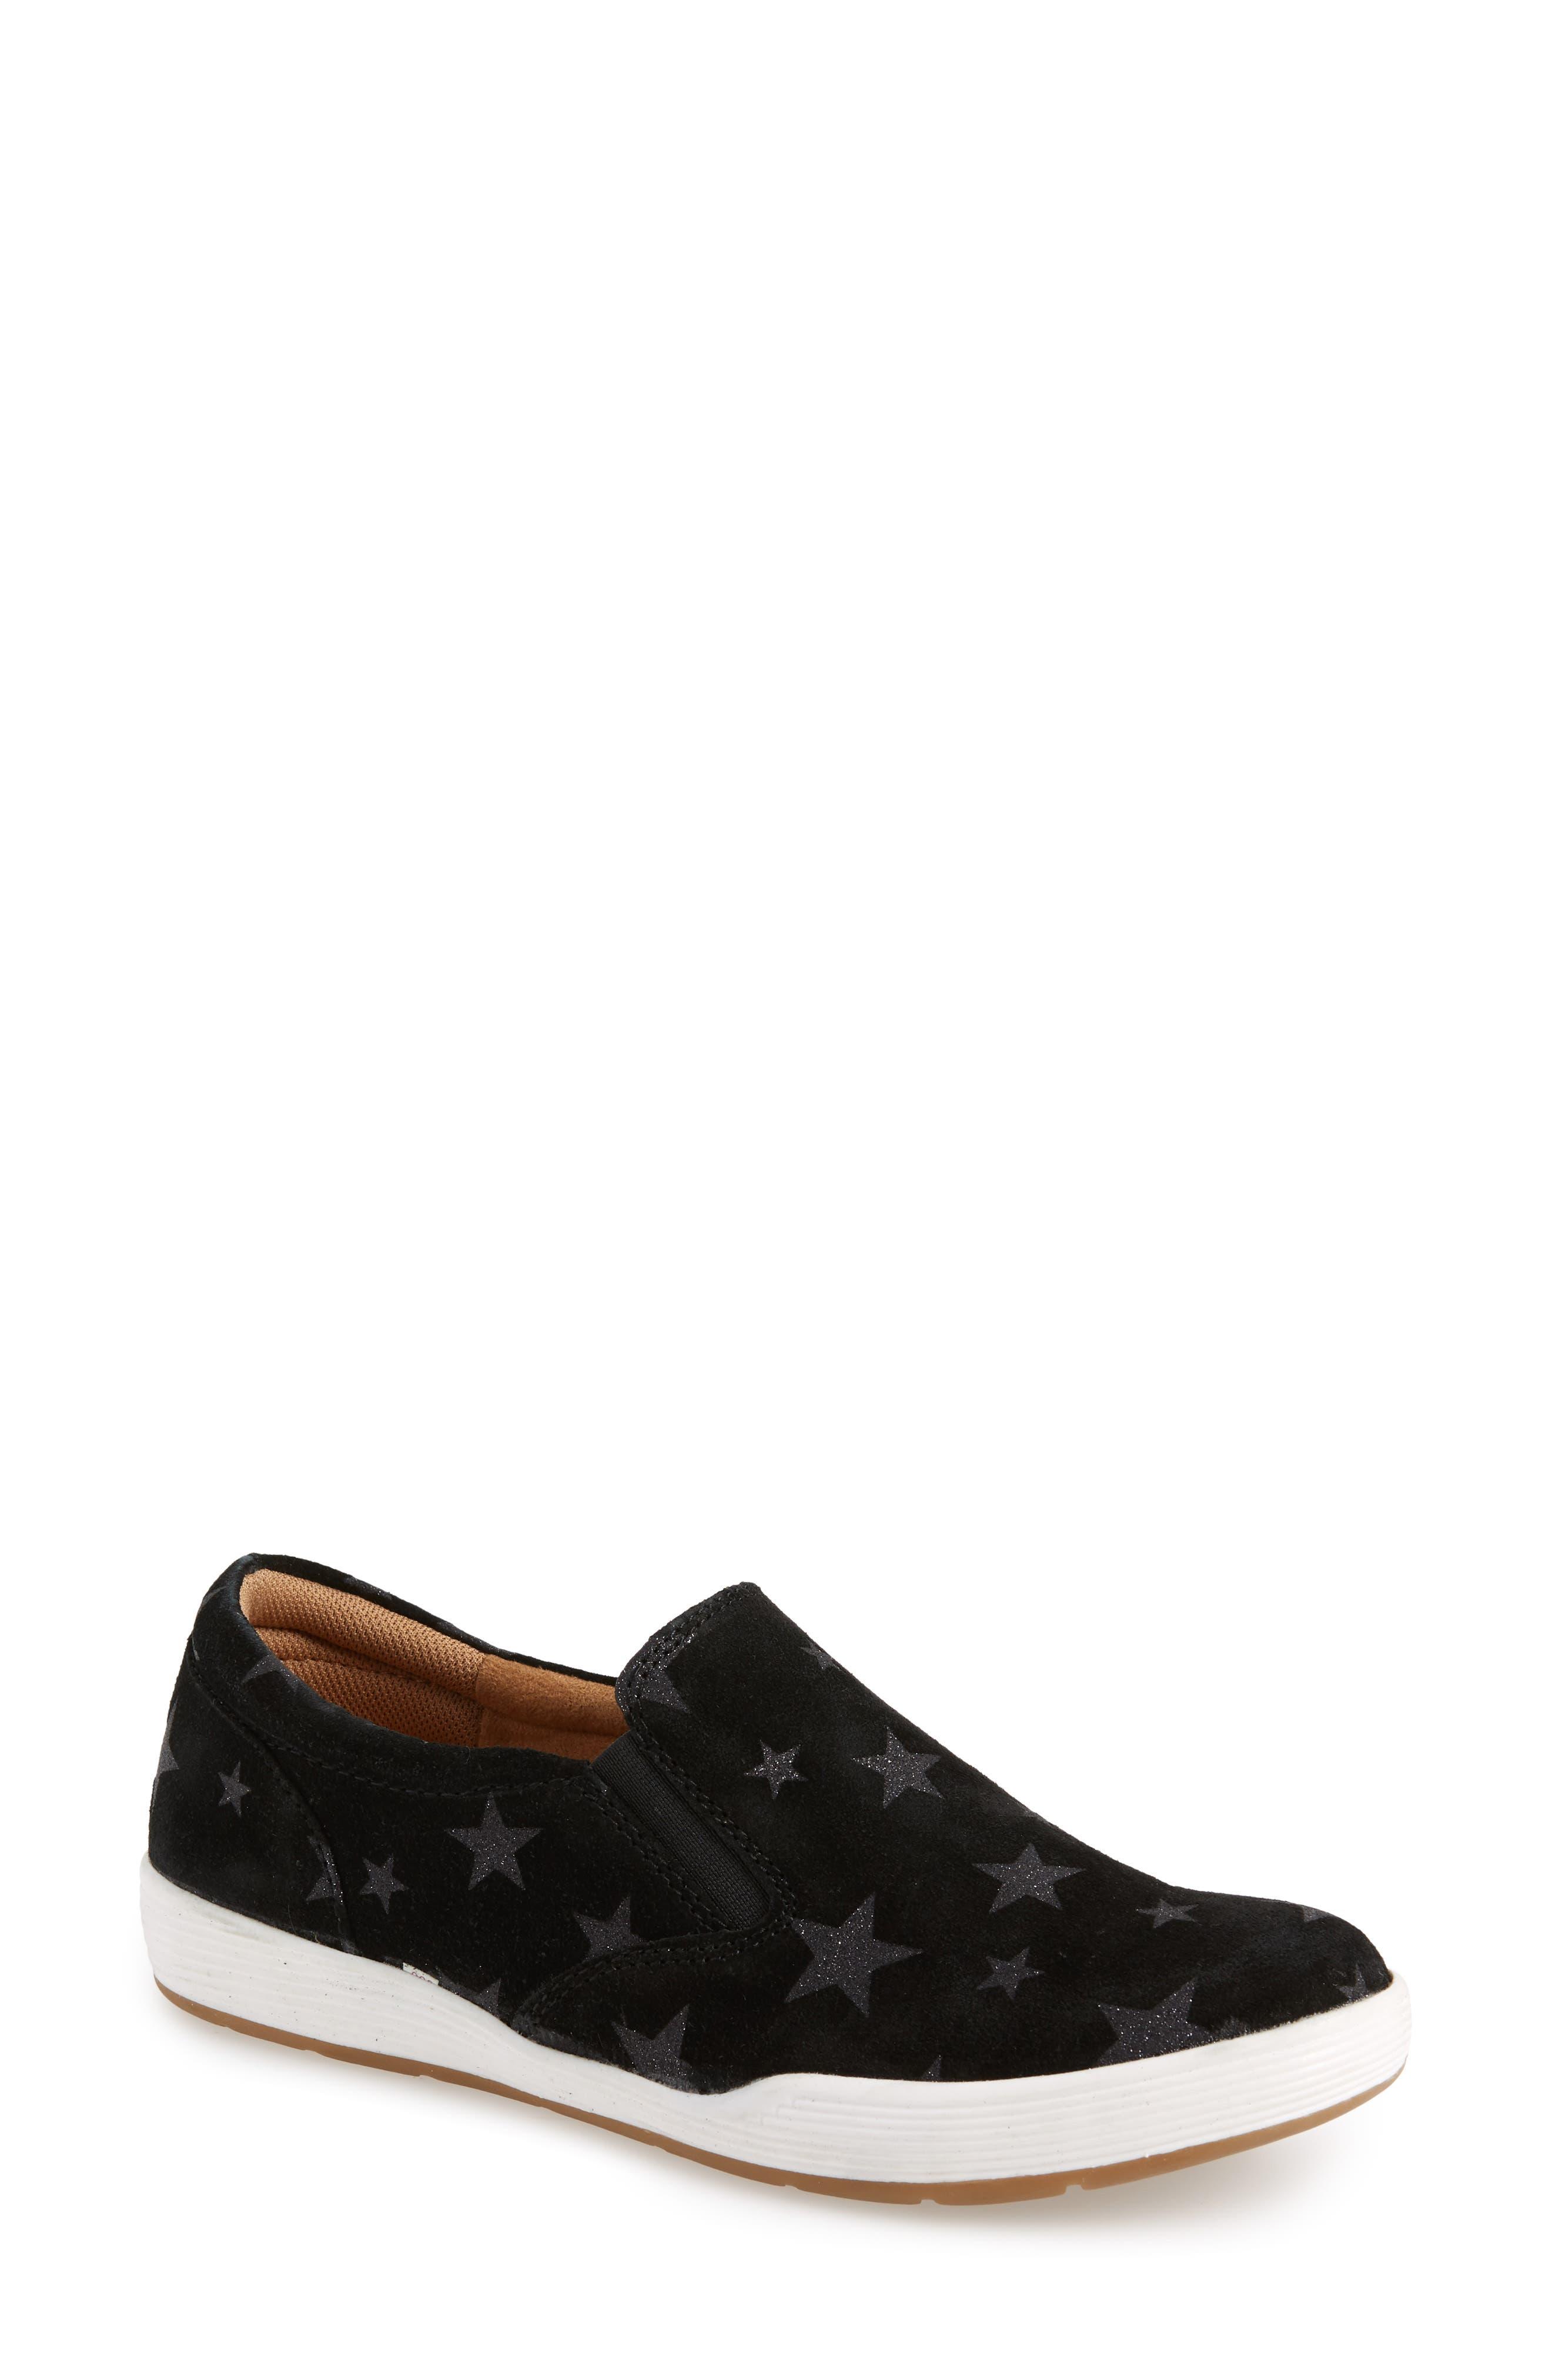 Linette Suede Slip-On Sneaker, Main, color, BLACK SUEDE